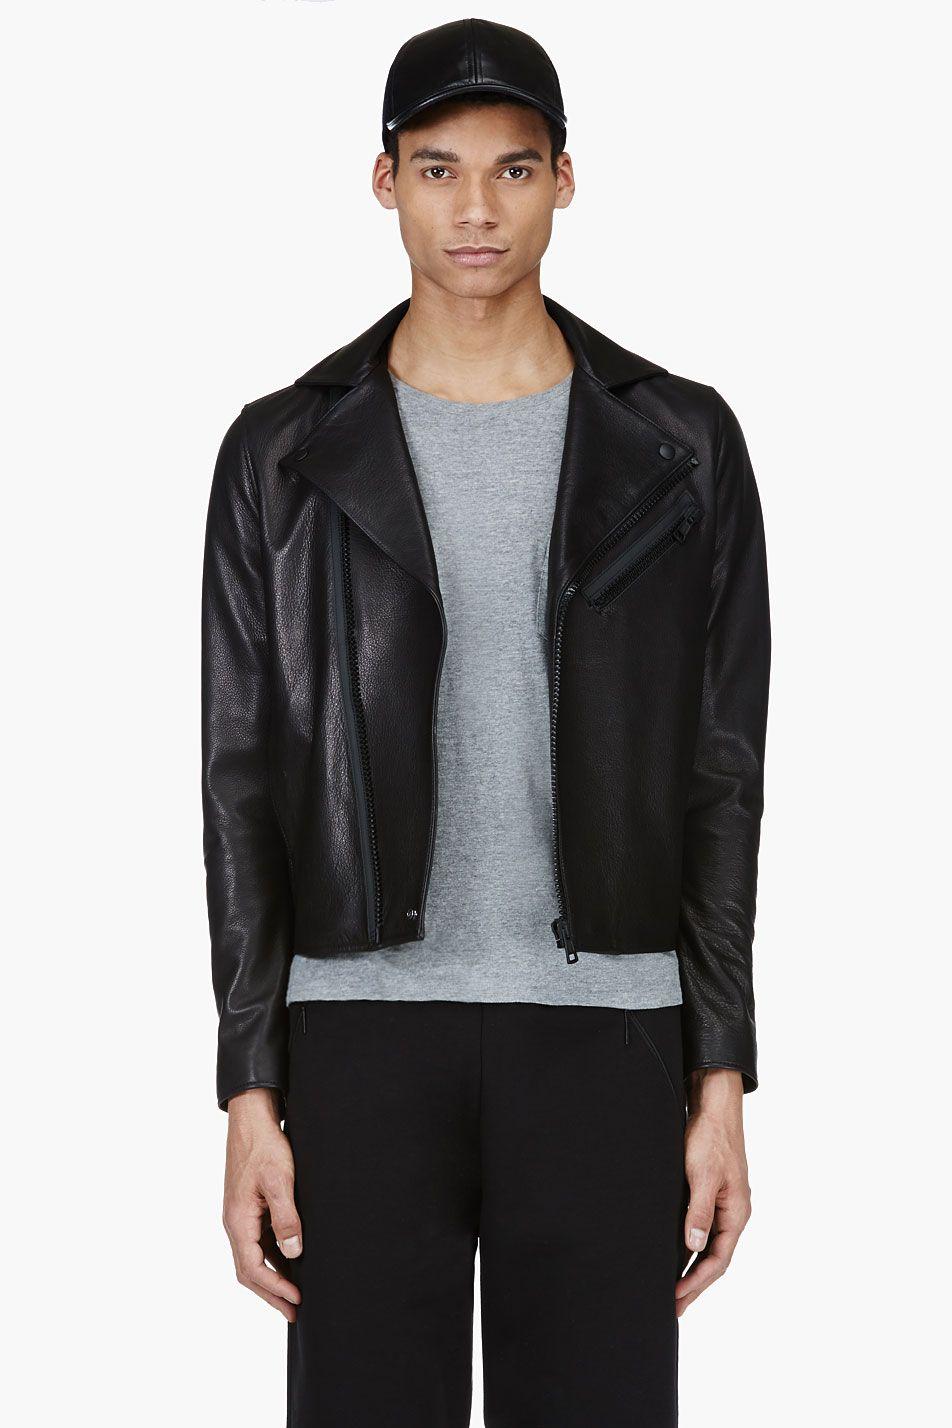 Acne Studios Black Leather Biker Jacket Black Leather Biker Jacket Stylish Jackets Leather Biker Jacket